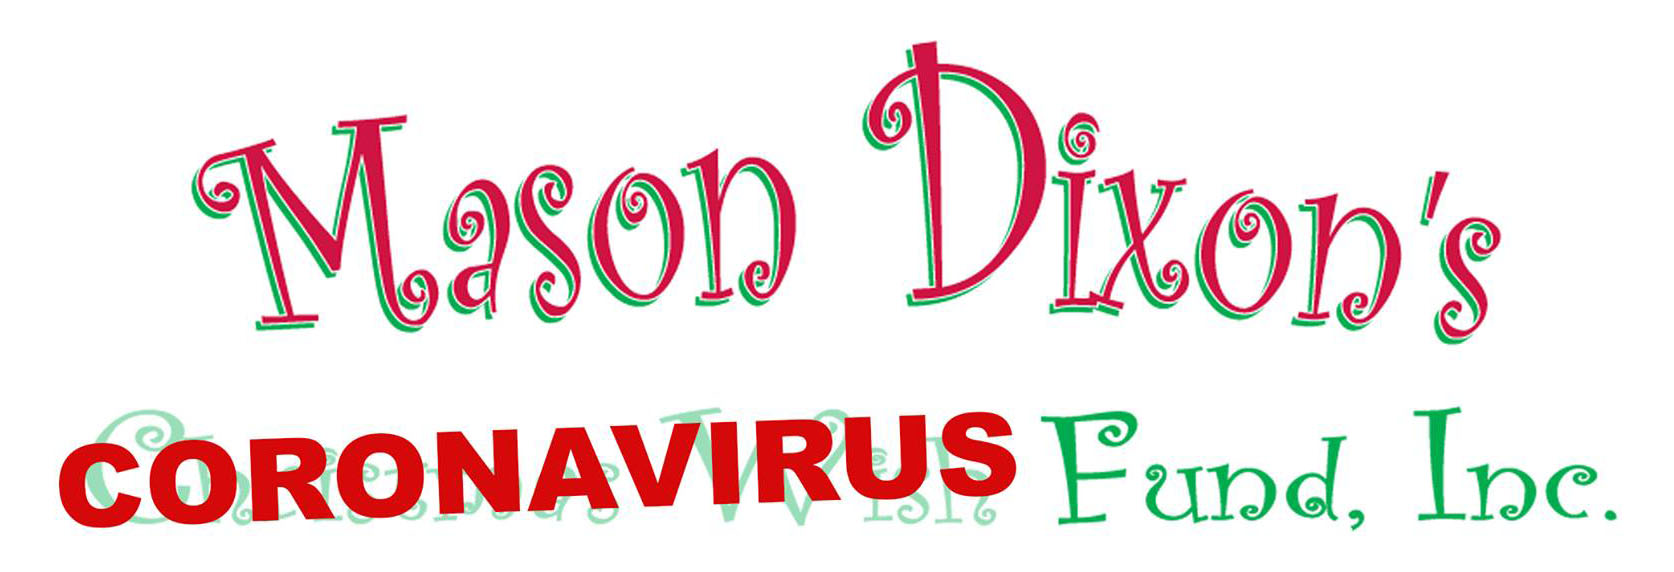 Mason Dixon's Christmas Wish Fund